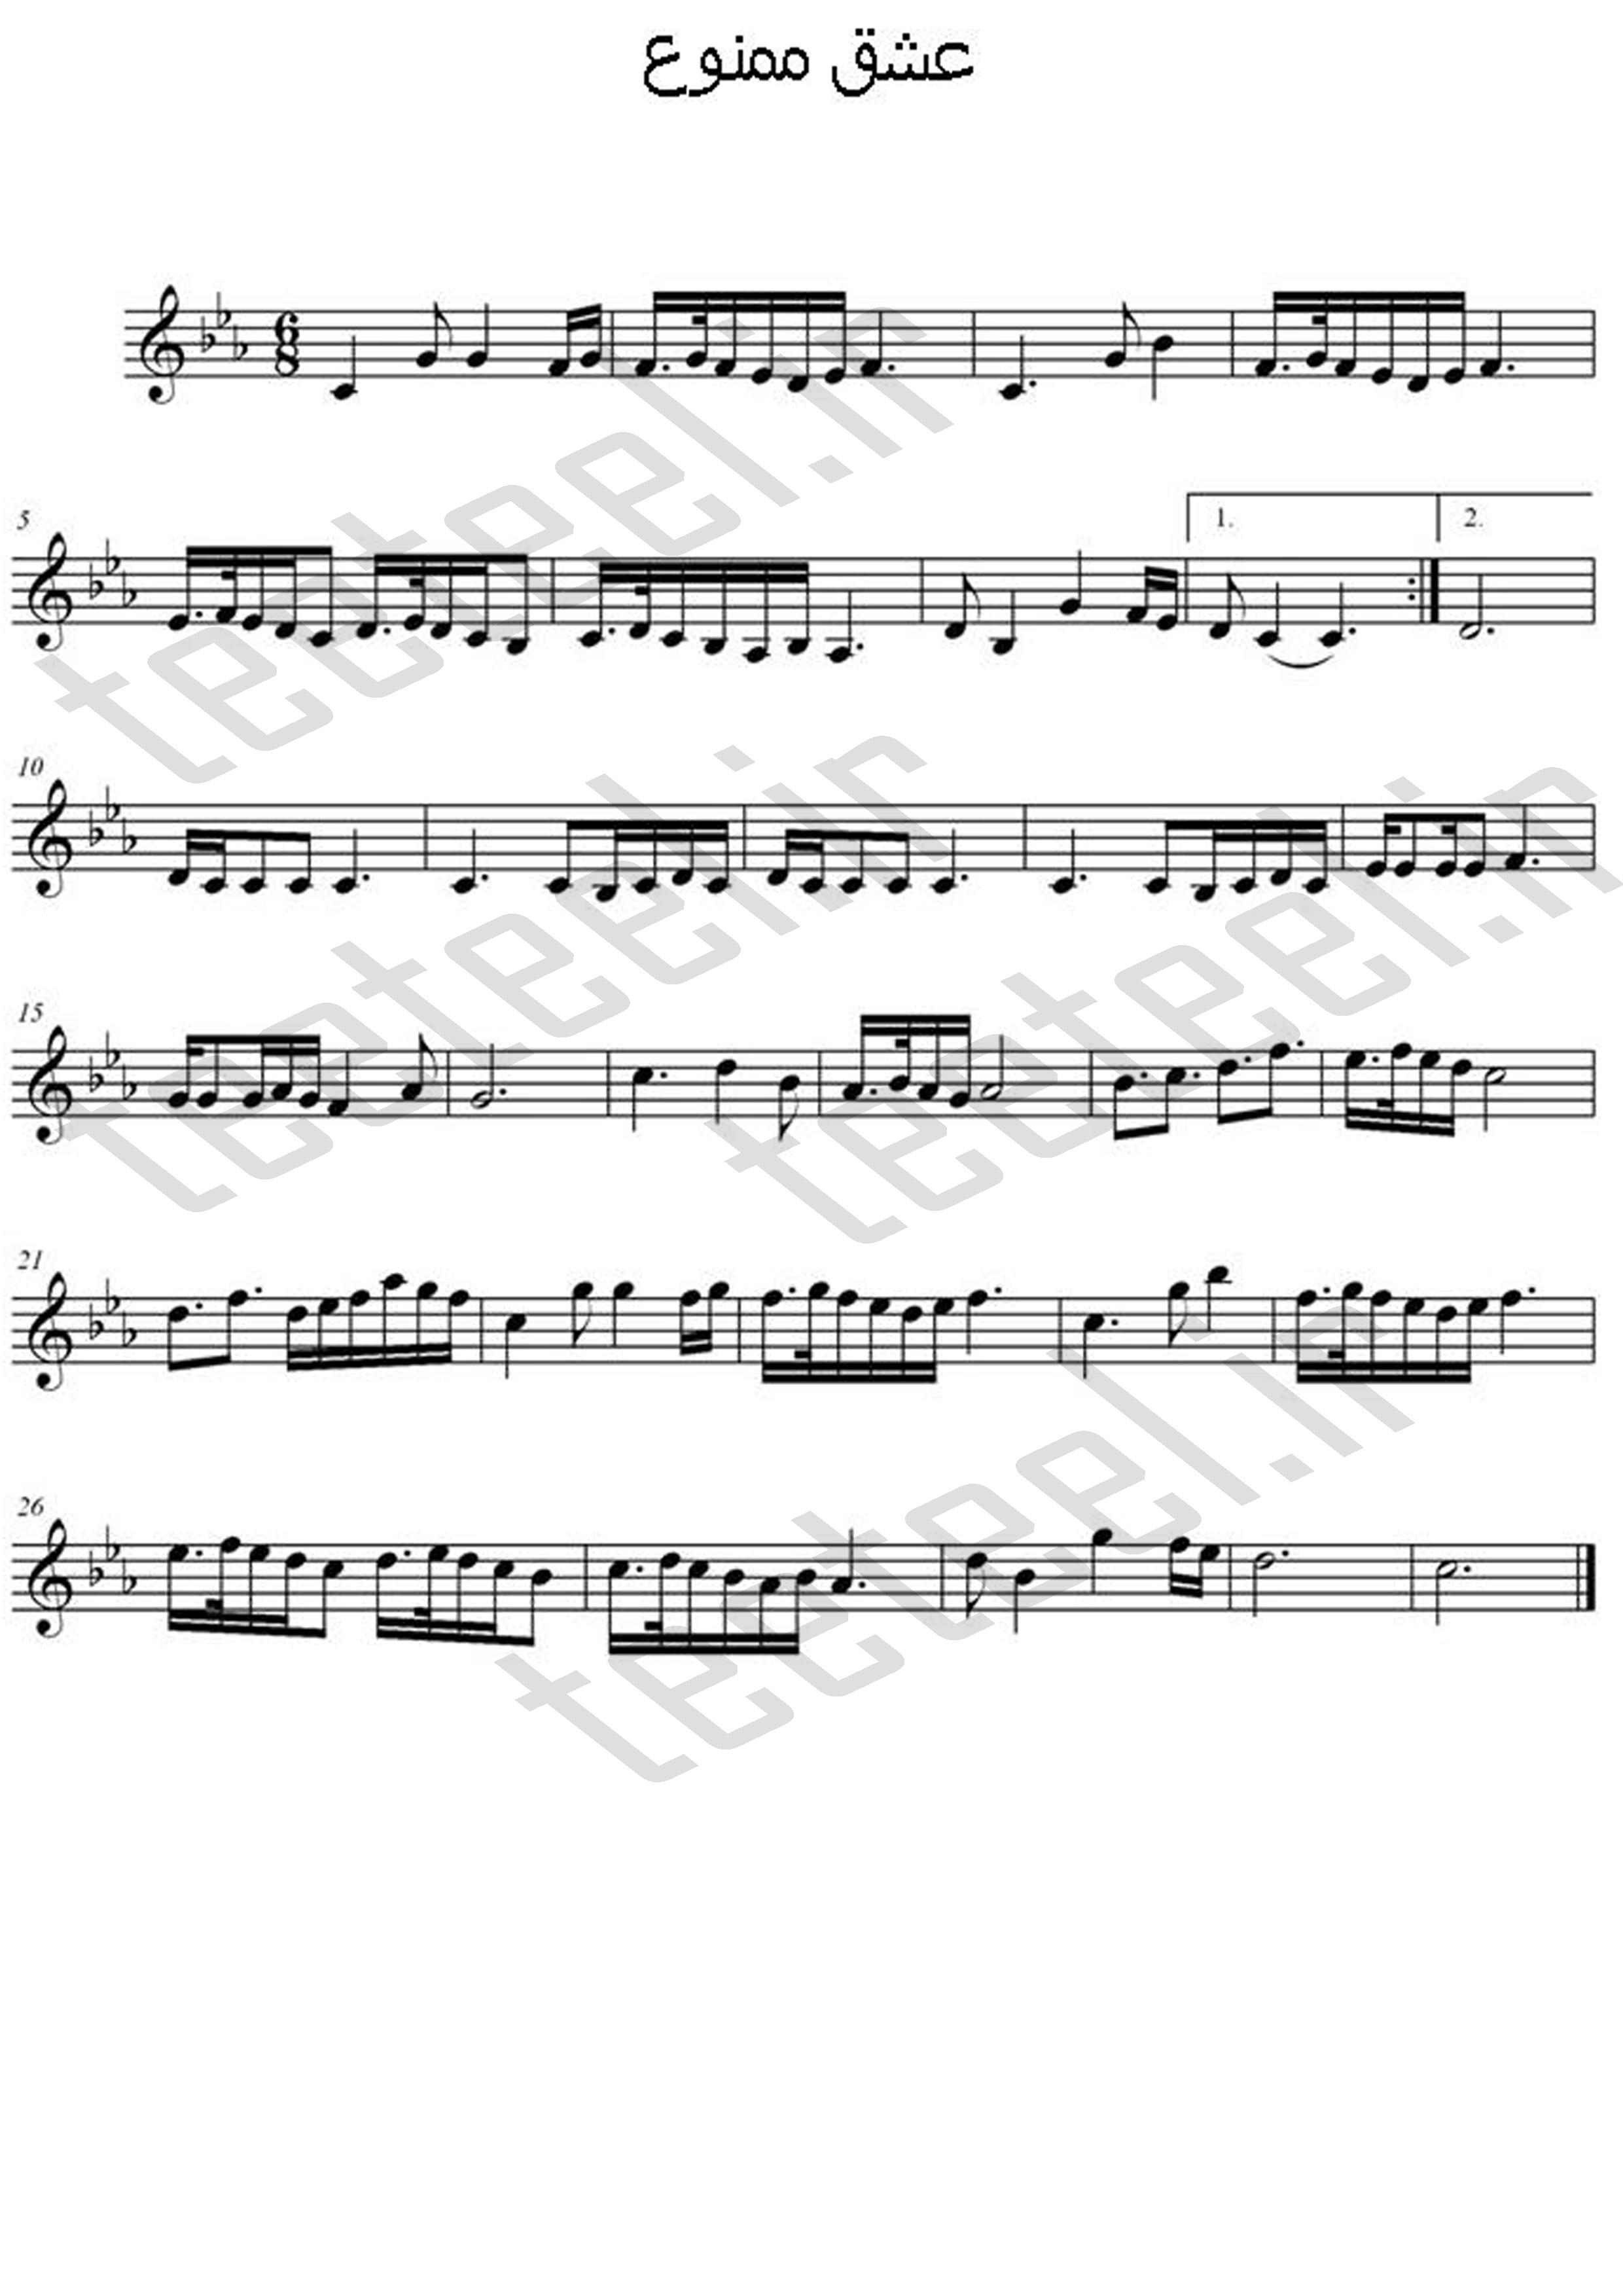 دانلود+آهنگ+بی+کلام+پیانو+و+ویولن